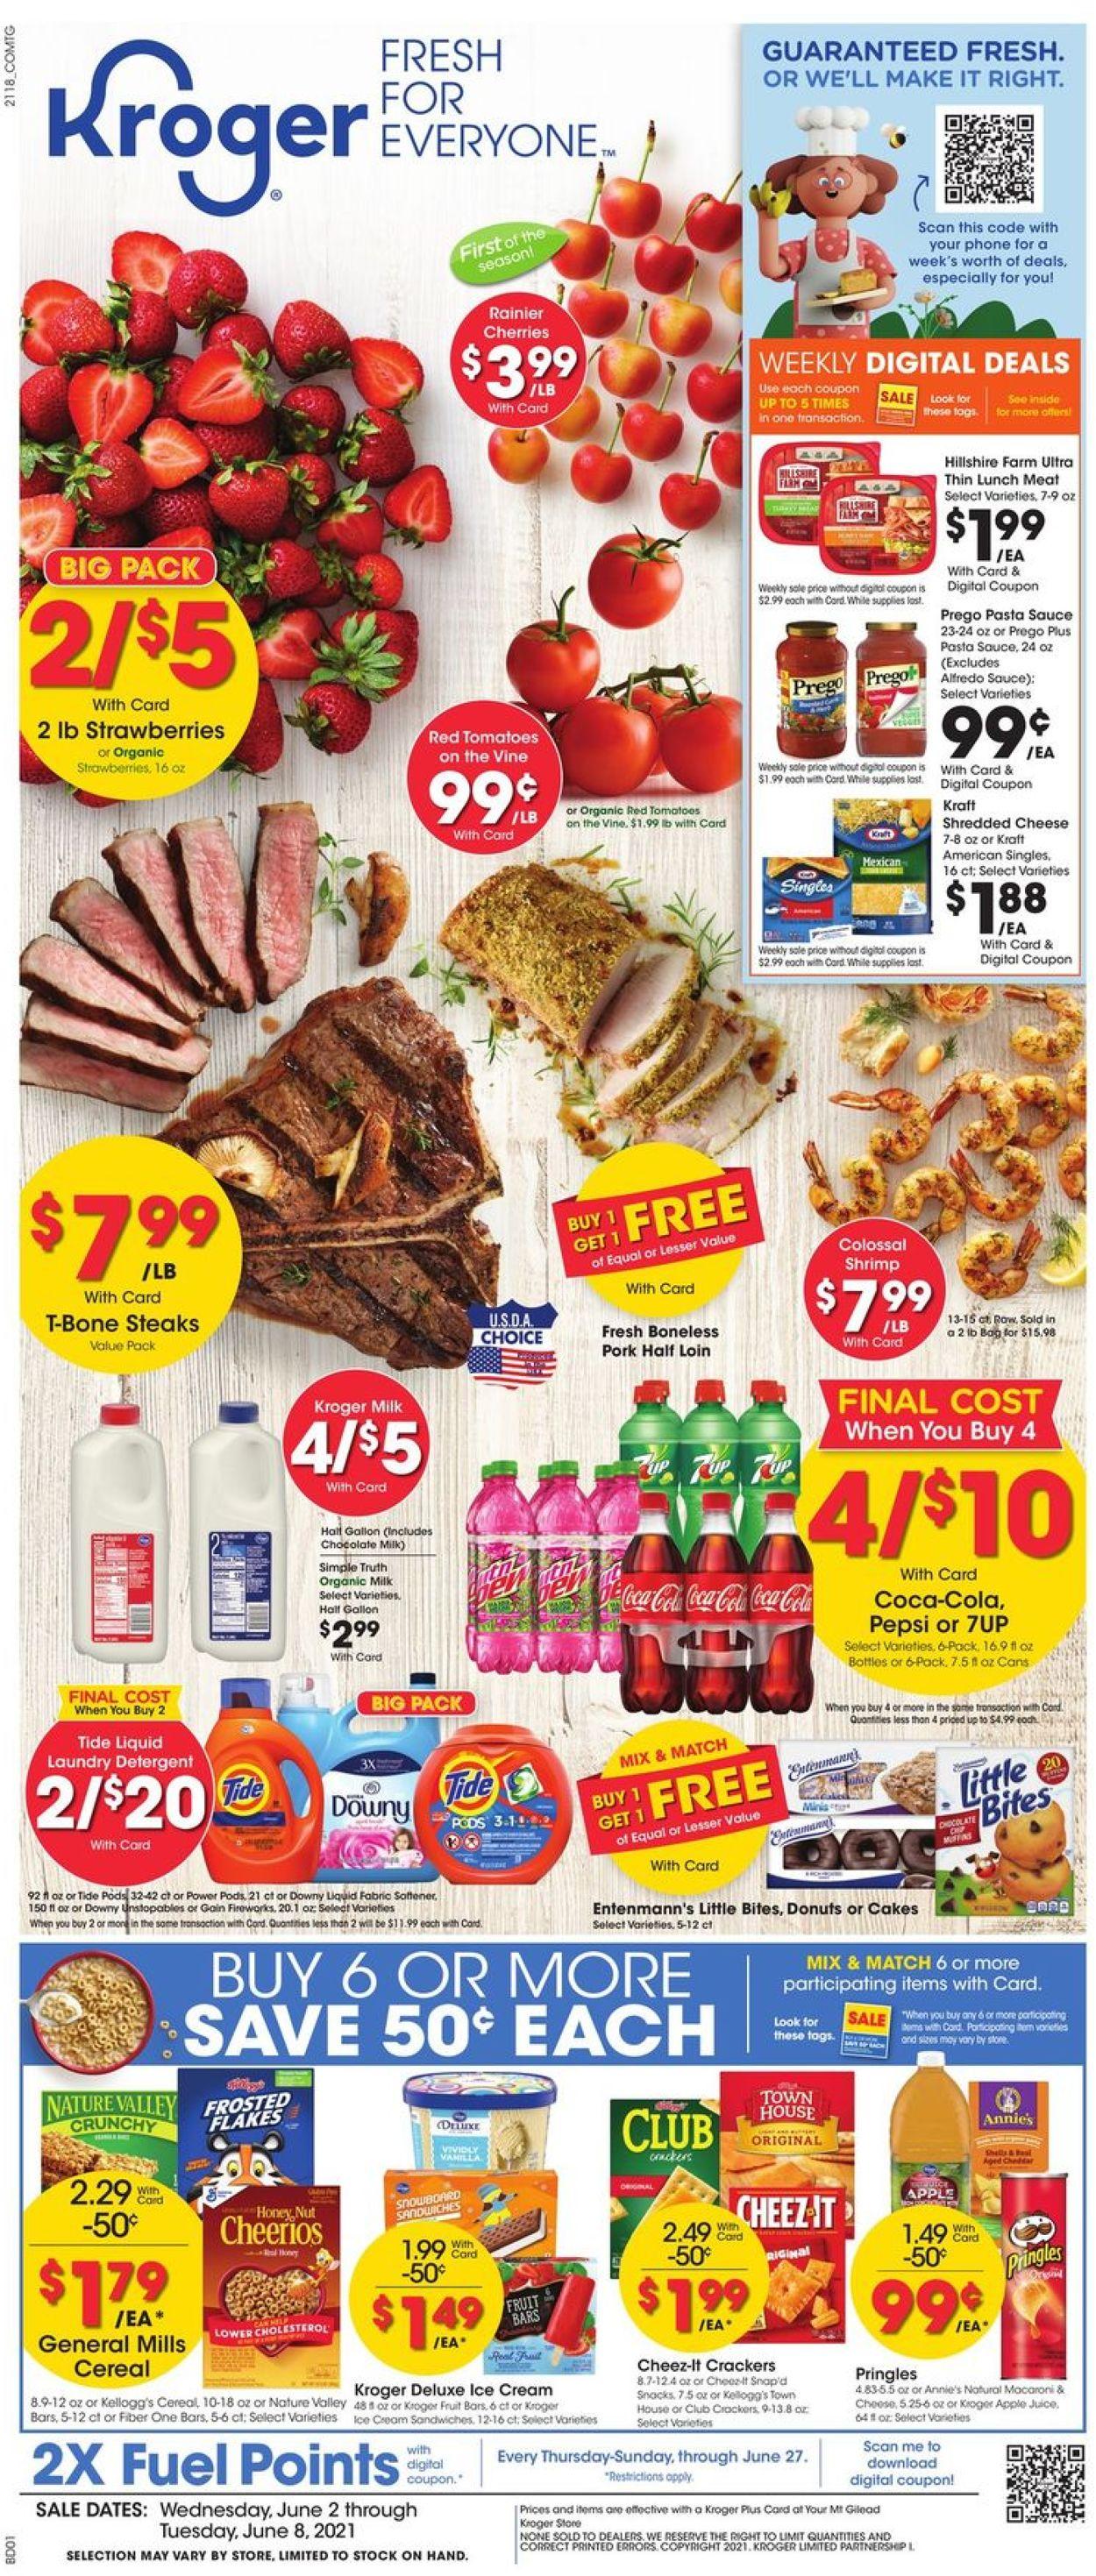 Kroger Weekly Ad Circular - valid 06/02-06/08/2021